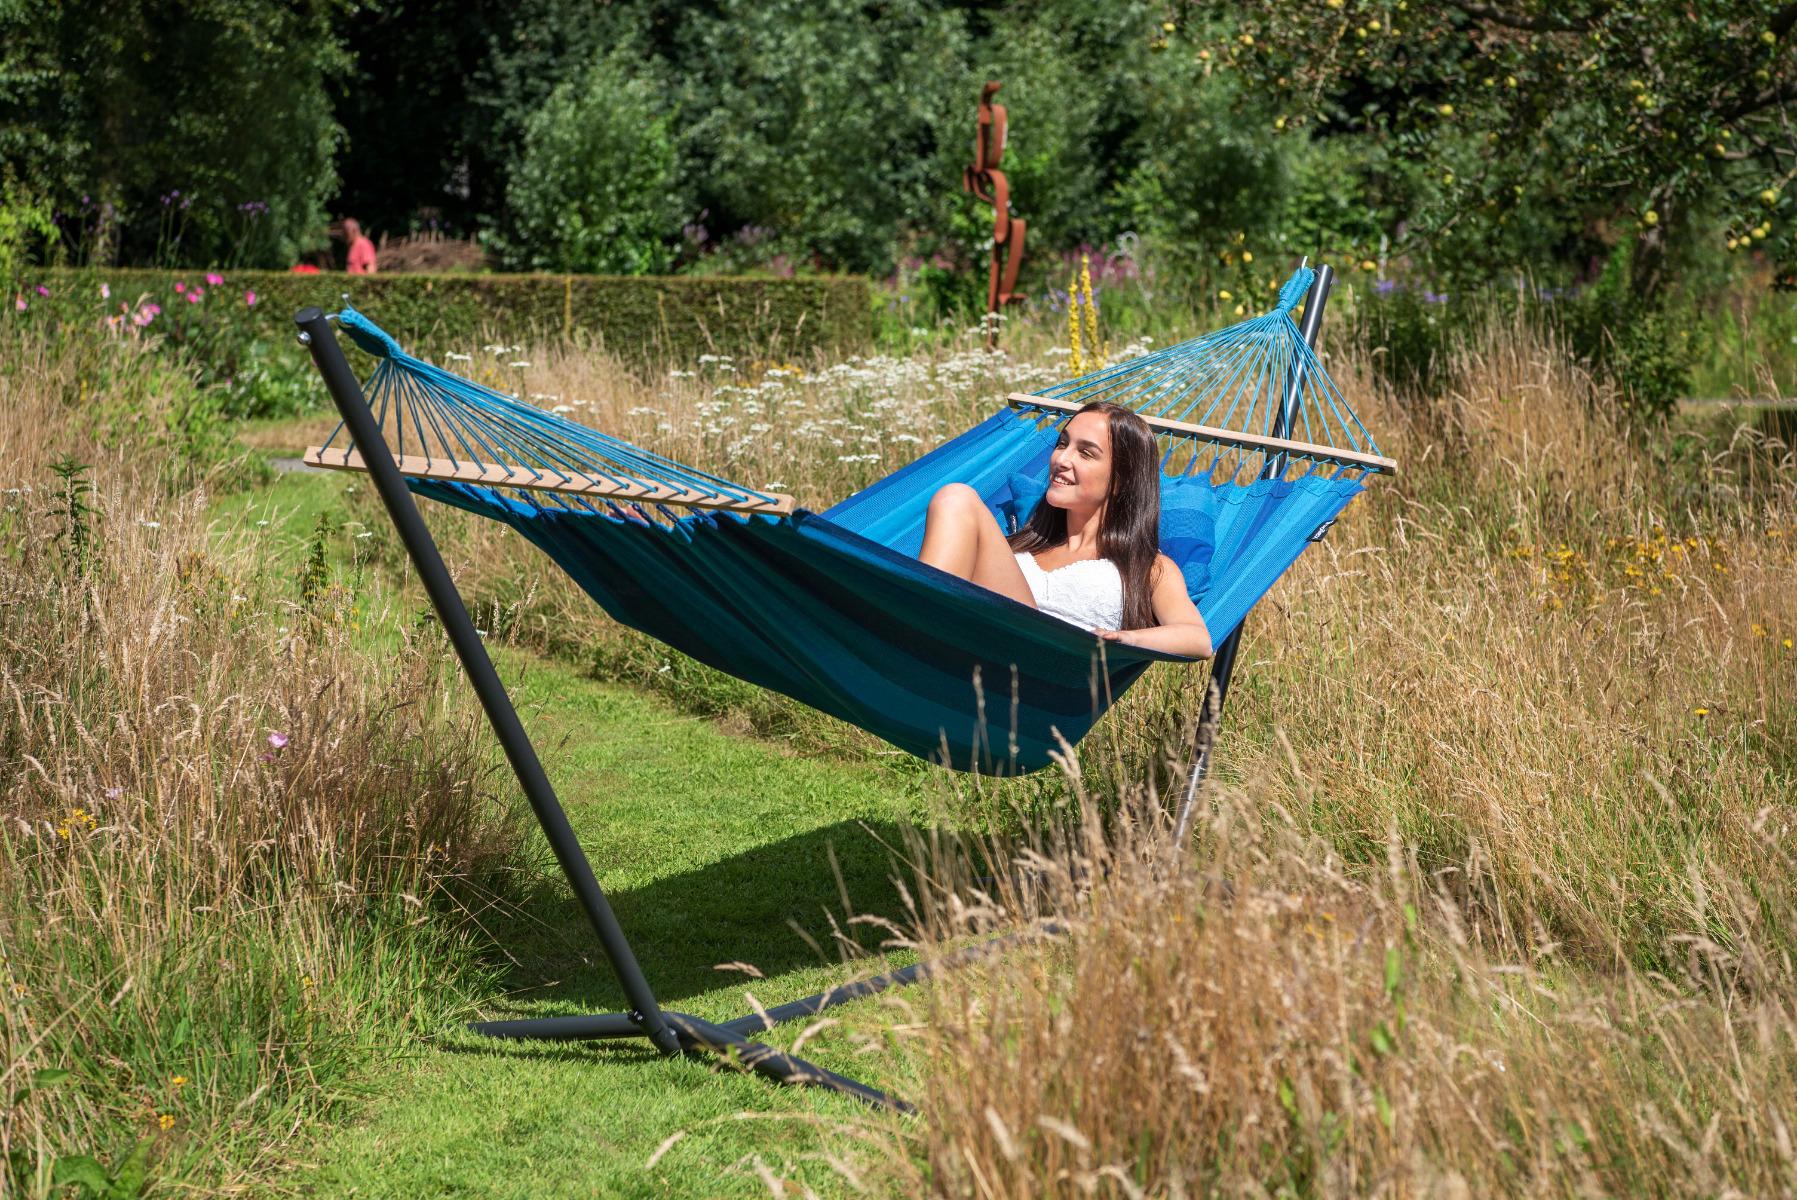 'Easy & Relax' Blue E�npersoons Hangmatset - Blauw - Tropilex �